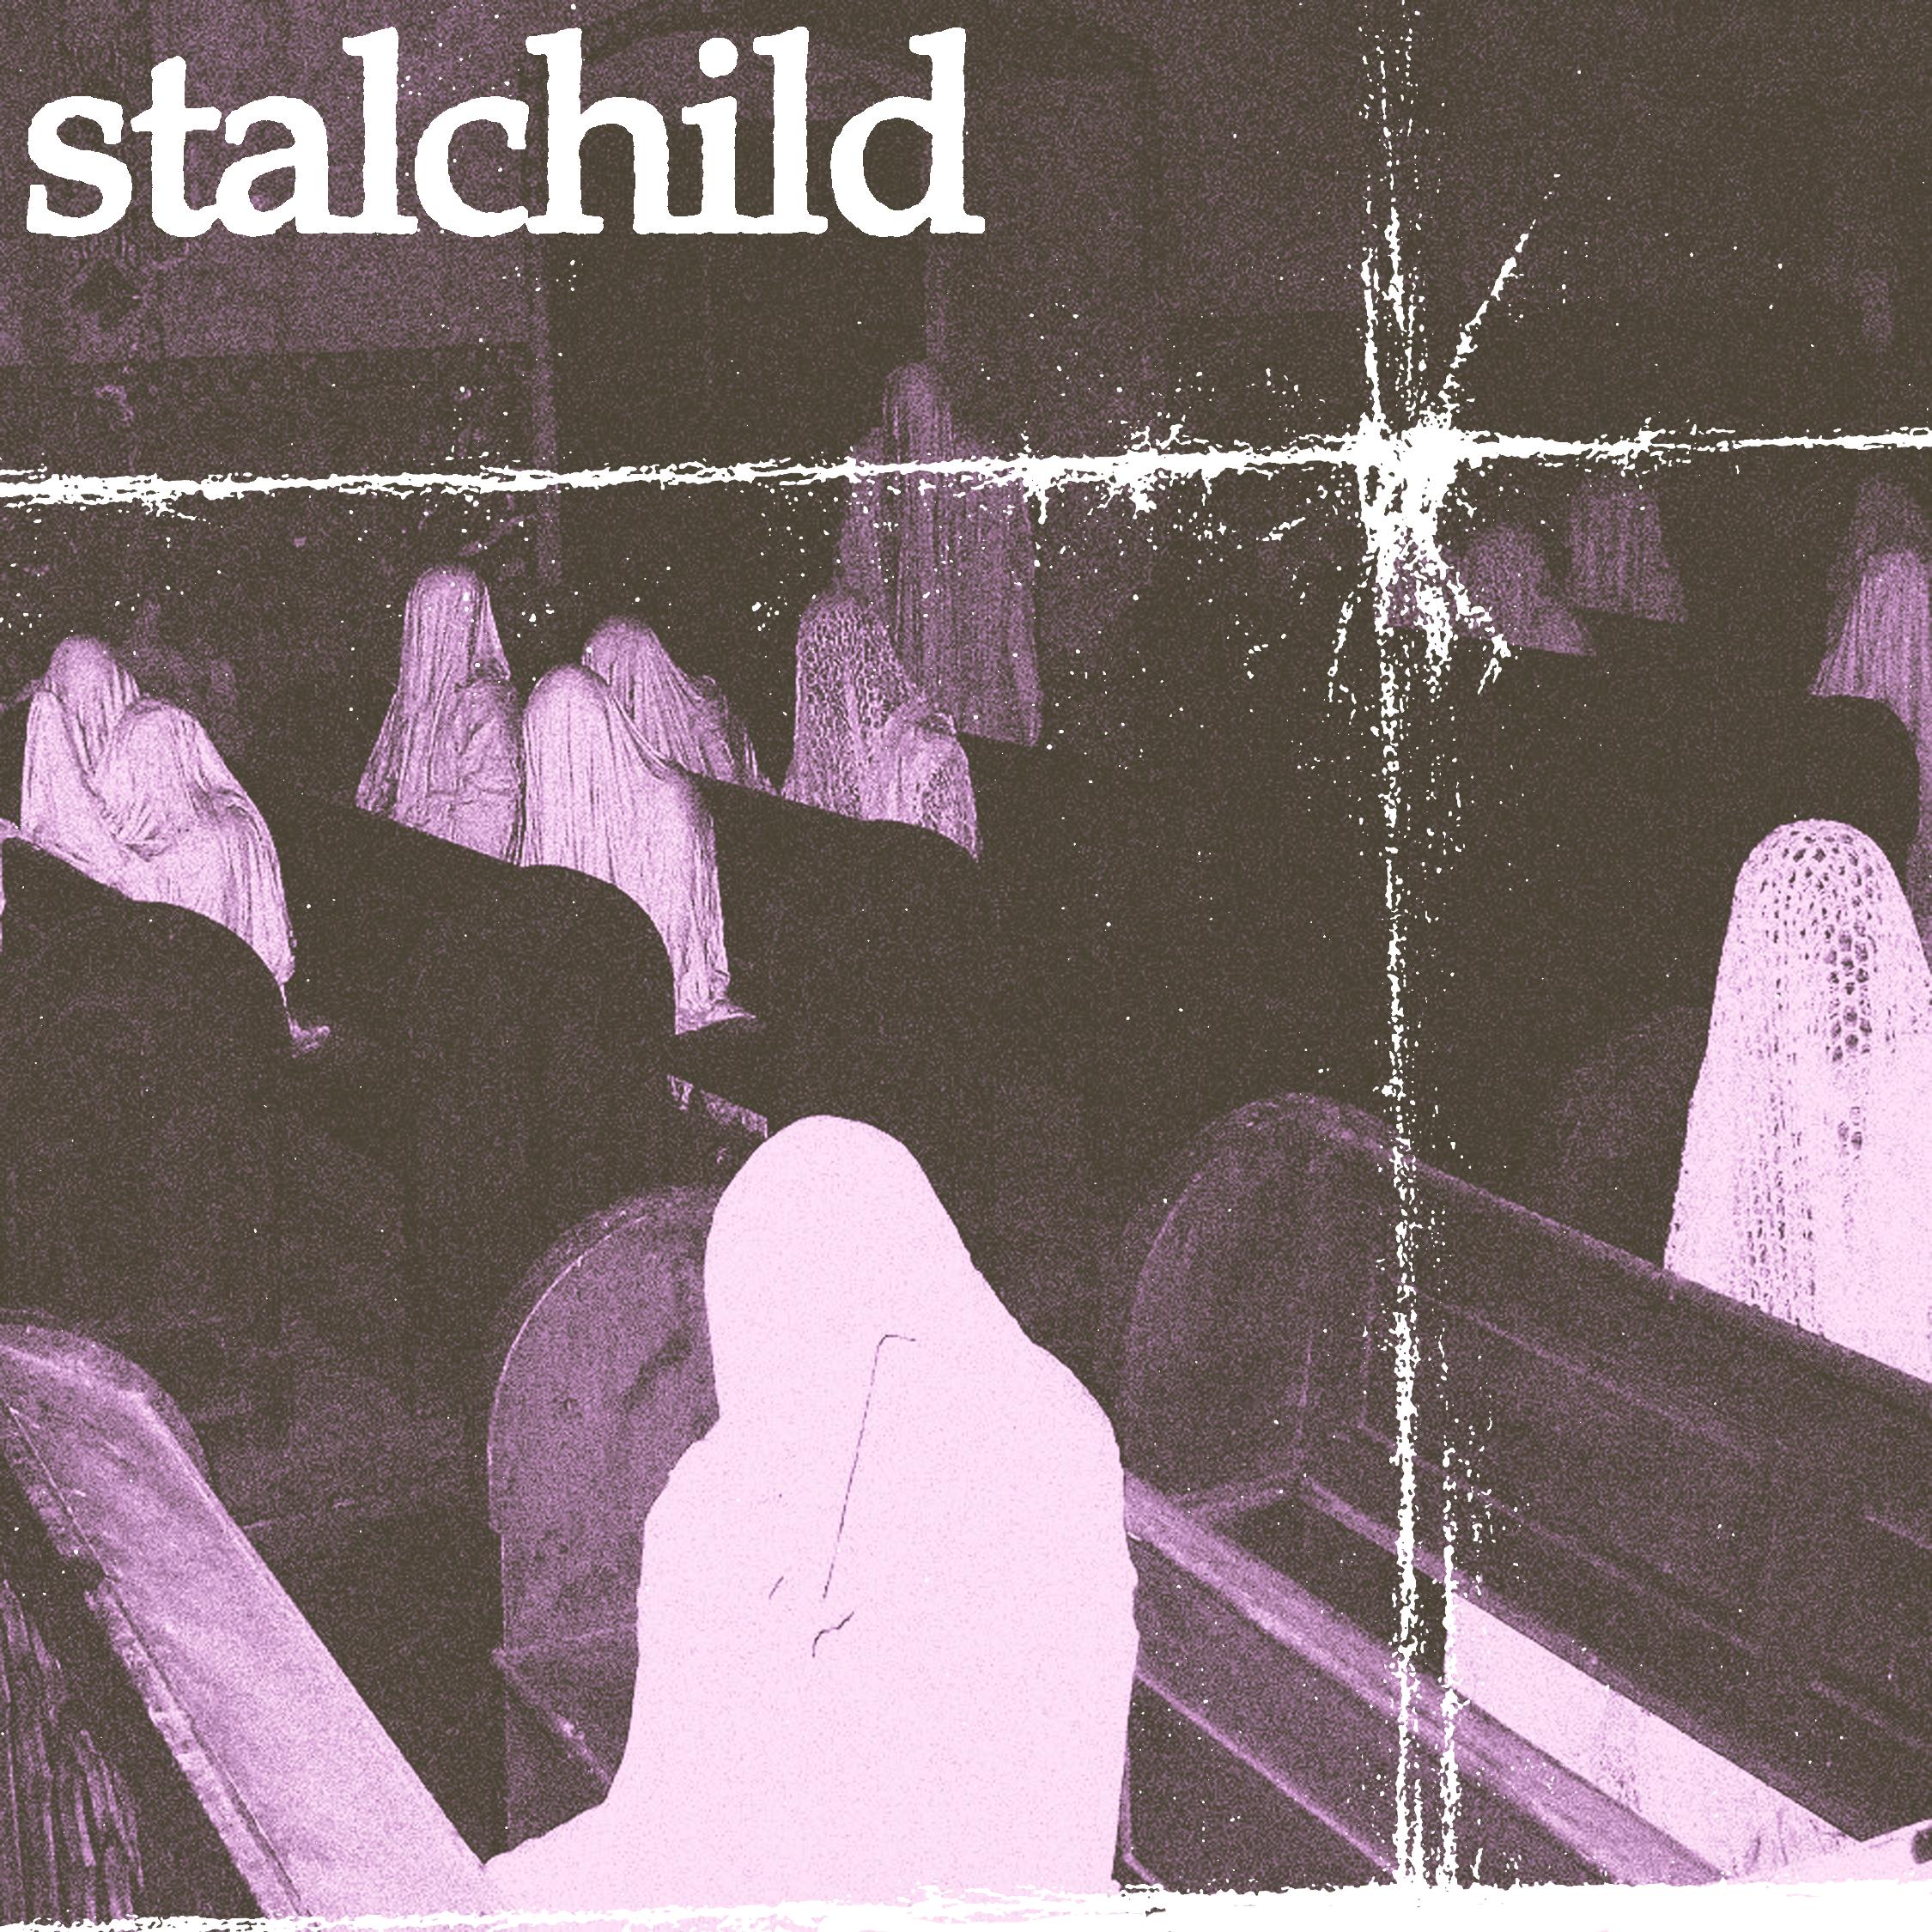 Stalchild